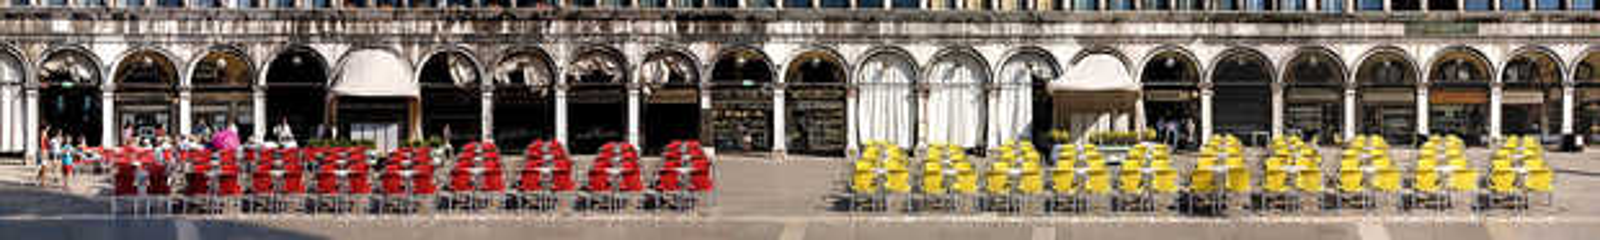 Venice, Piazza San Marco - Larry Yust